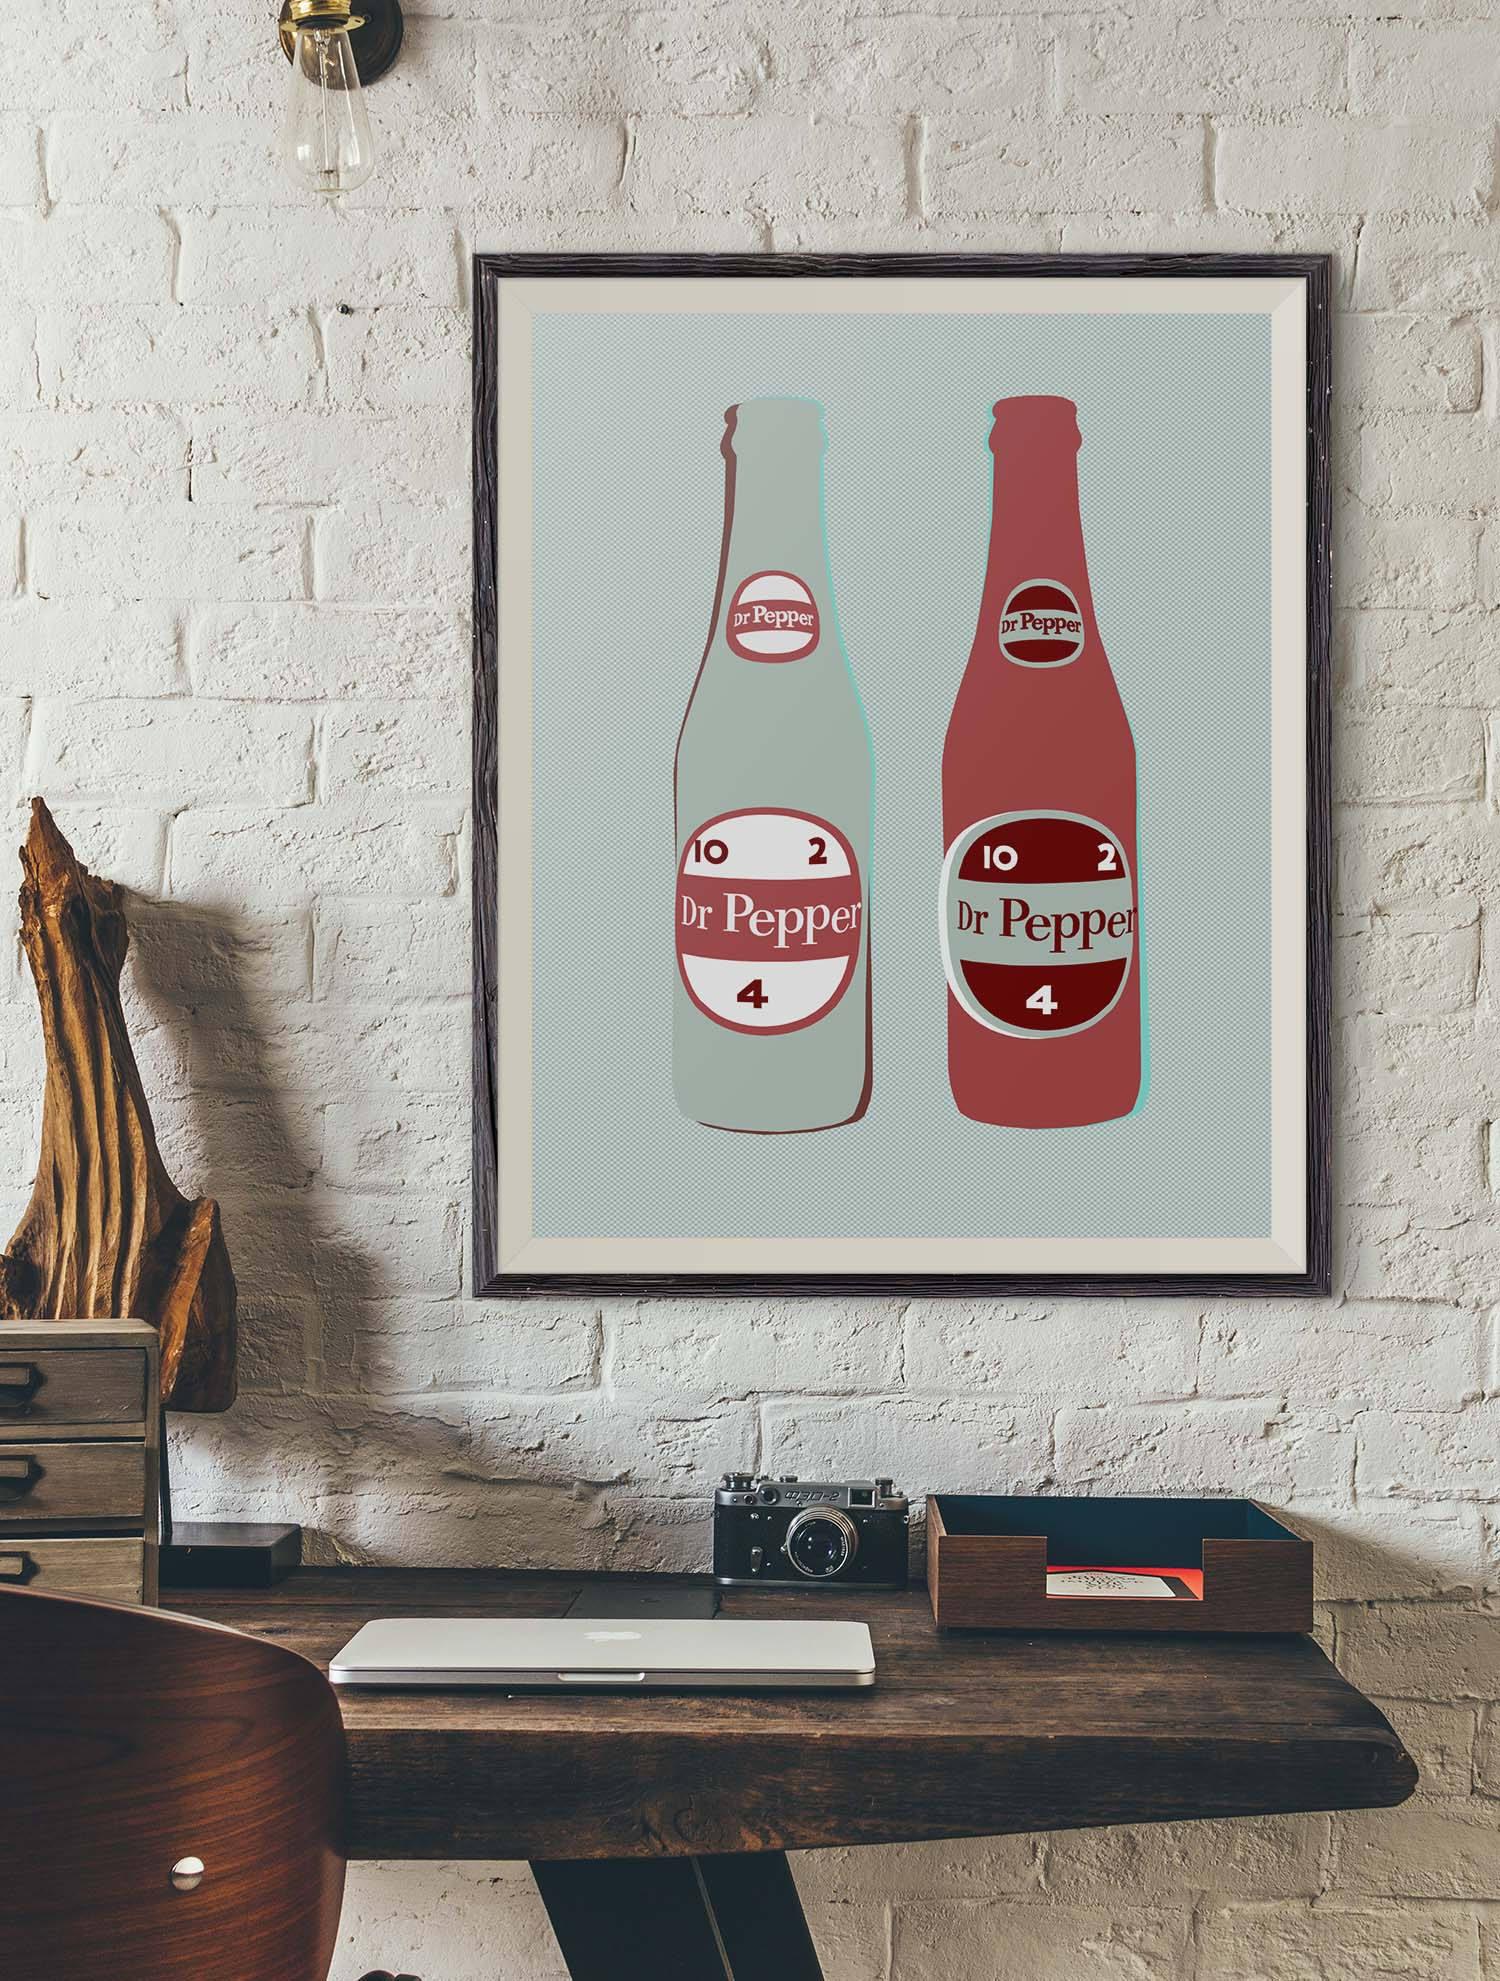 Dr. Pepper Vintage Soda Pop Bottle Pop Art Print Poster | Etsy